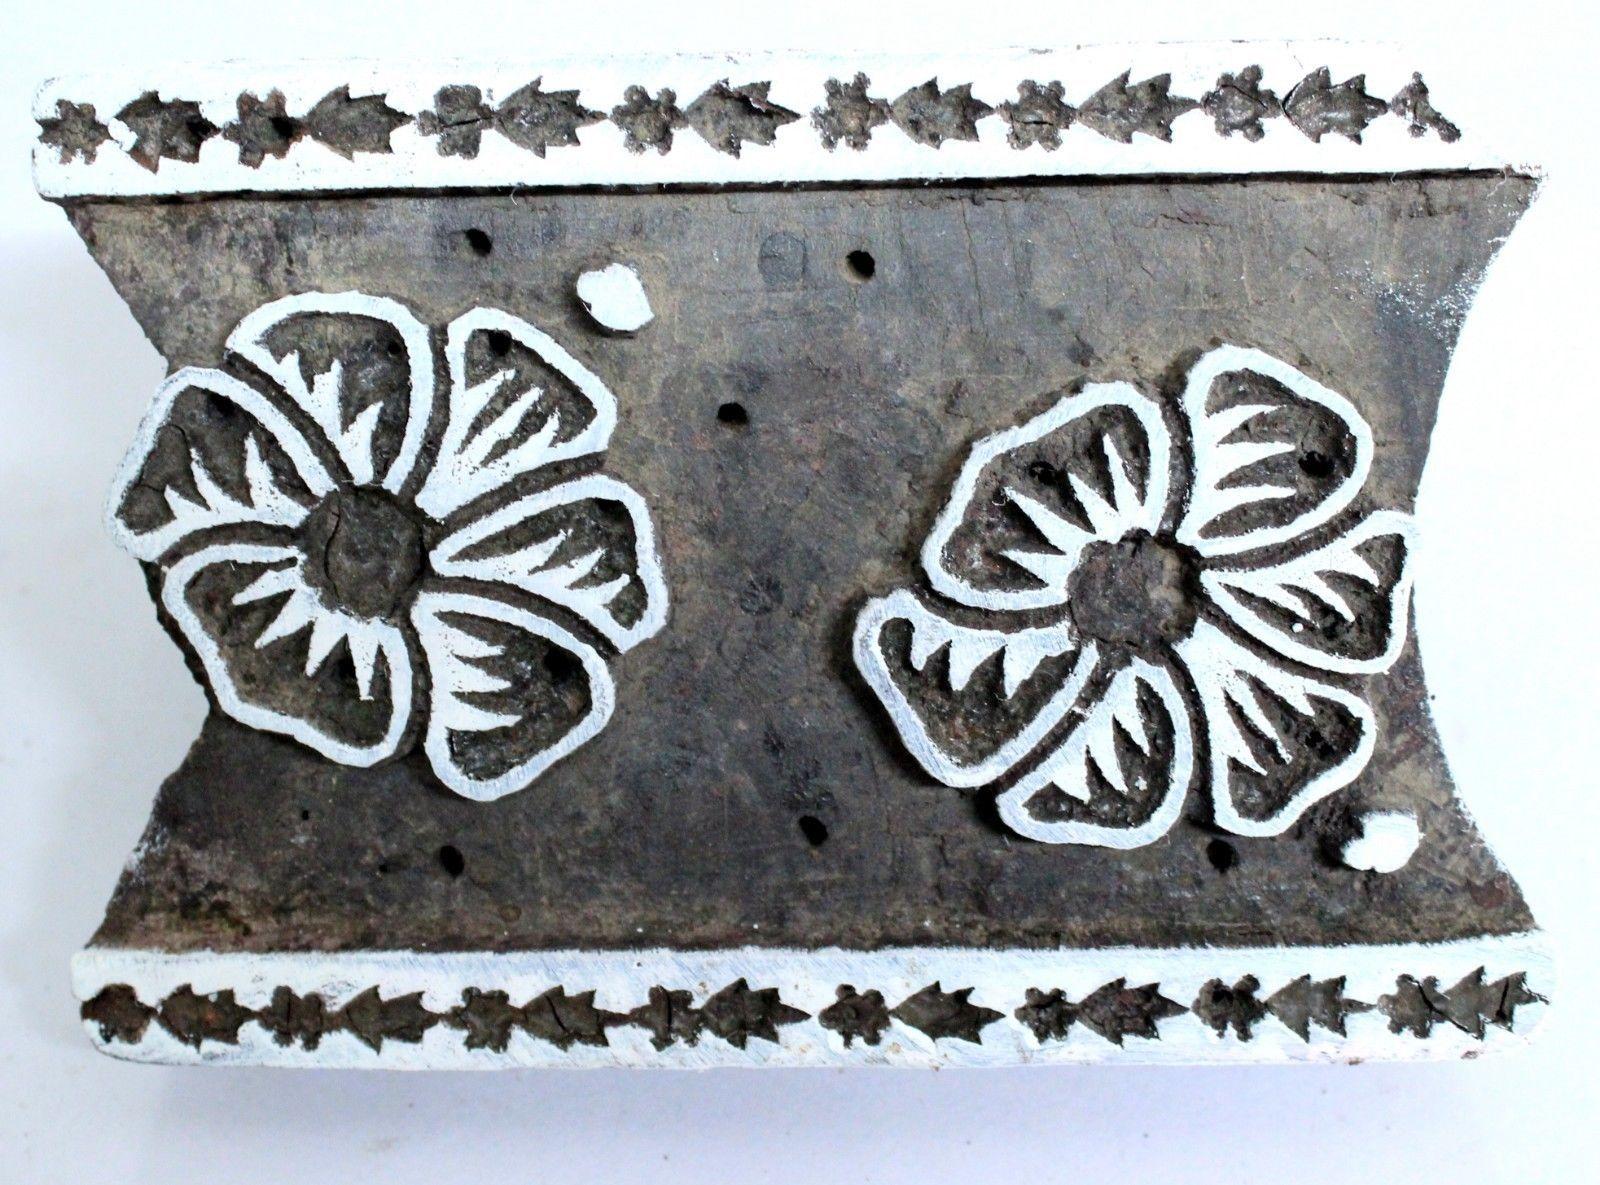 Wooden Printing Block Texitle Printing Design Block Vintage Stamp Block